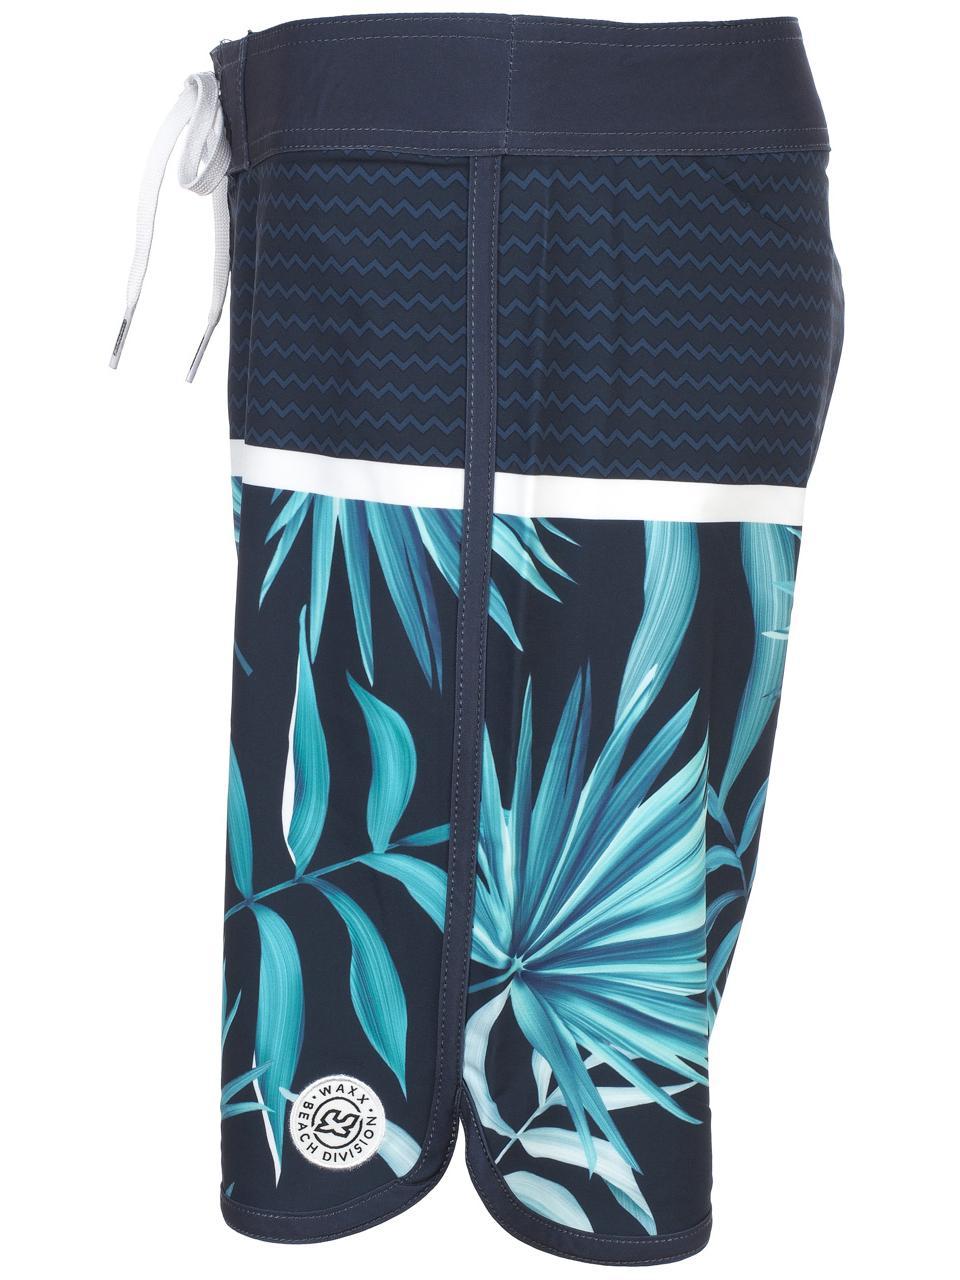 Boardshort-de-bain-Waxx-Boardie-costa-Bleu-77431-Neuf miniature 2